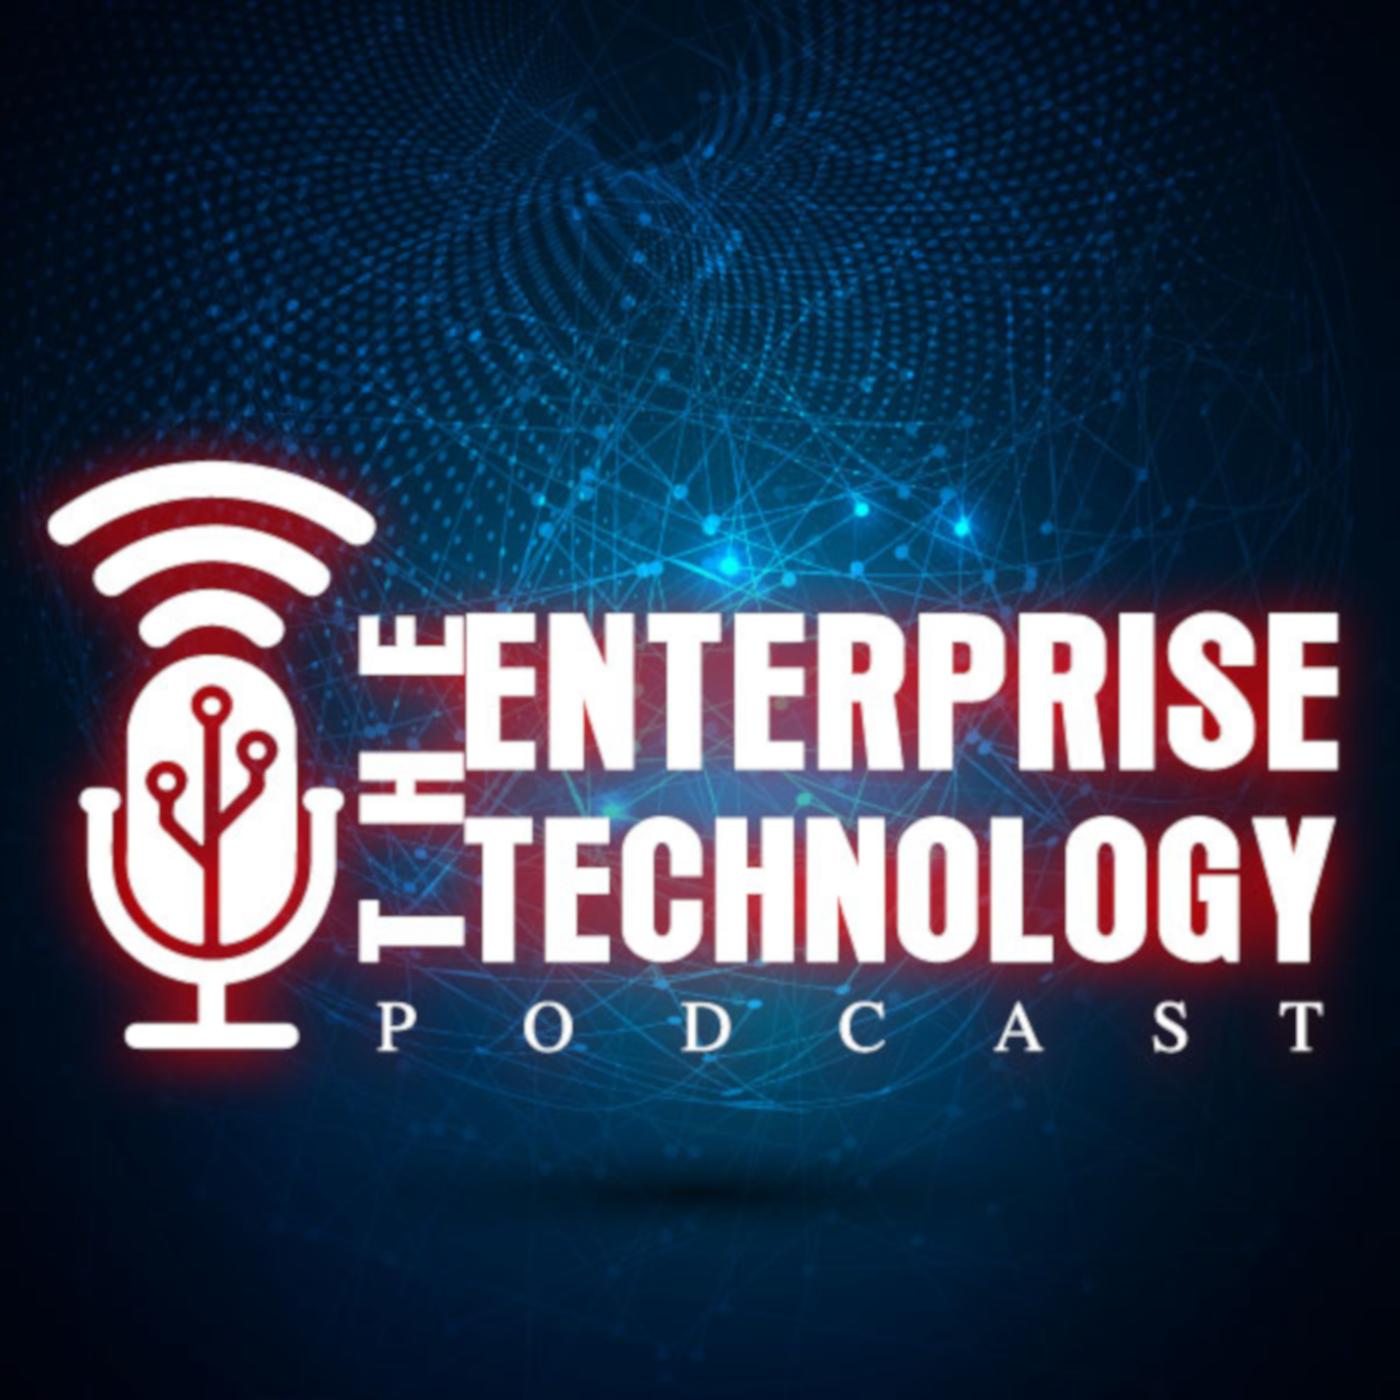 The Enterprise Technology Podcast